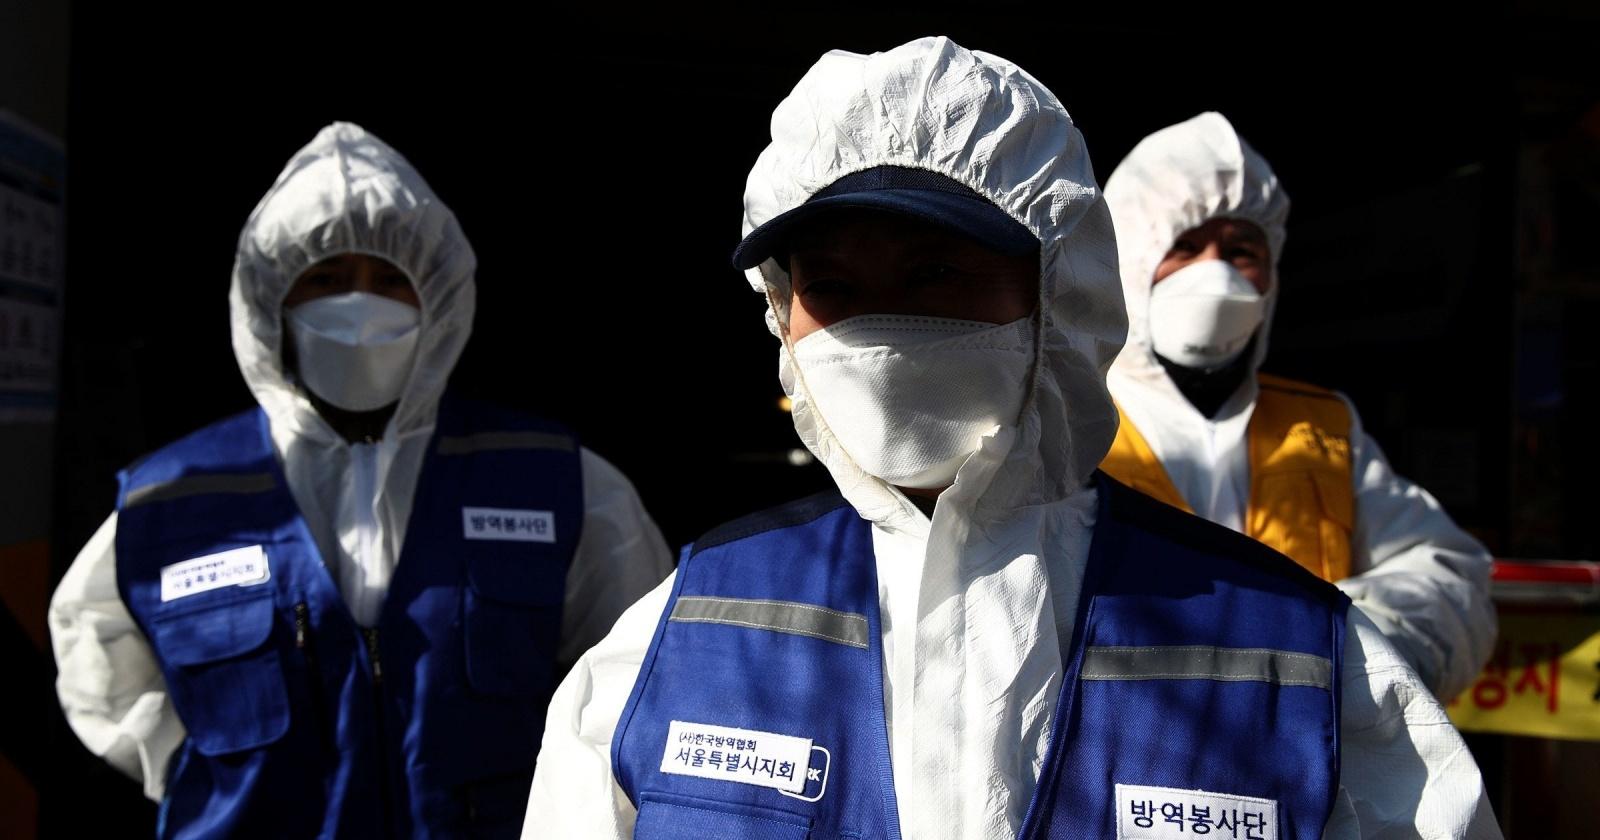 Институт Роберта Коха ждёт 2-летнюю пандемию коронавируса